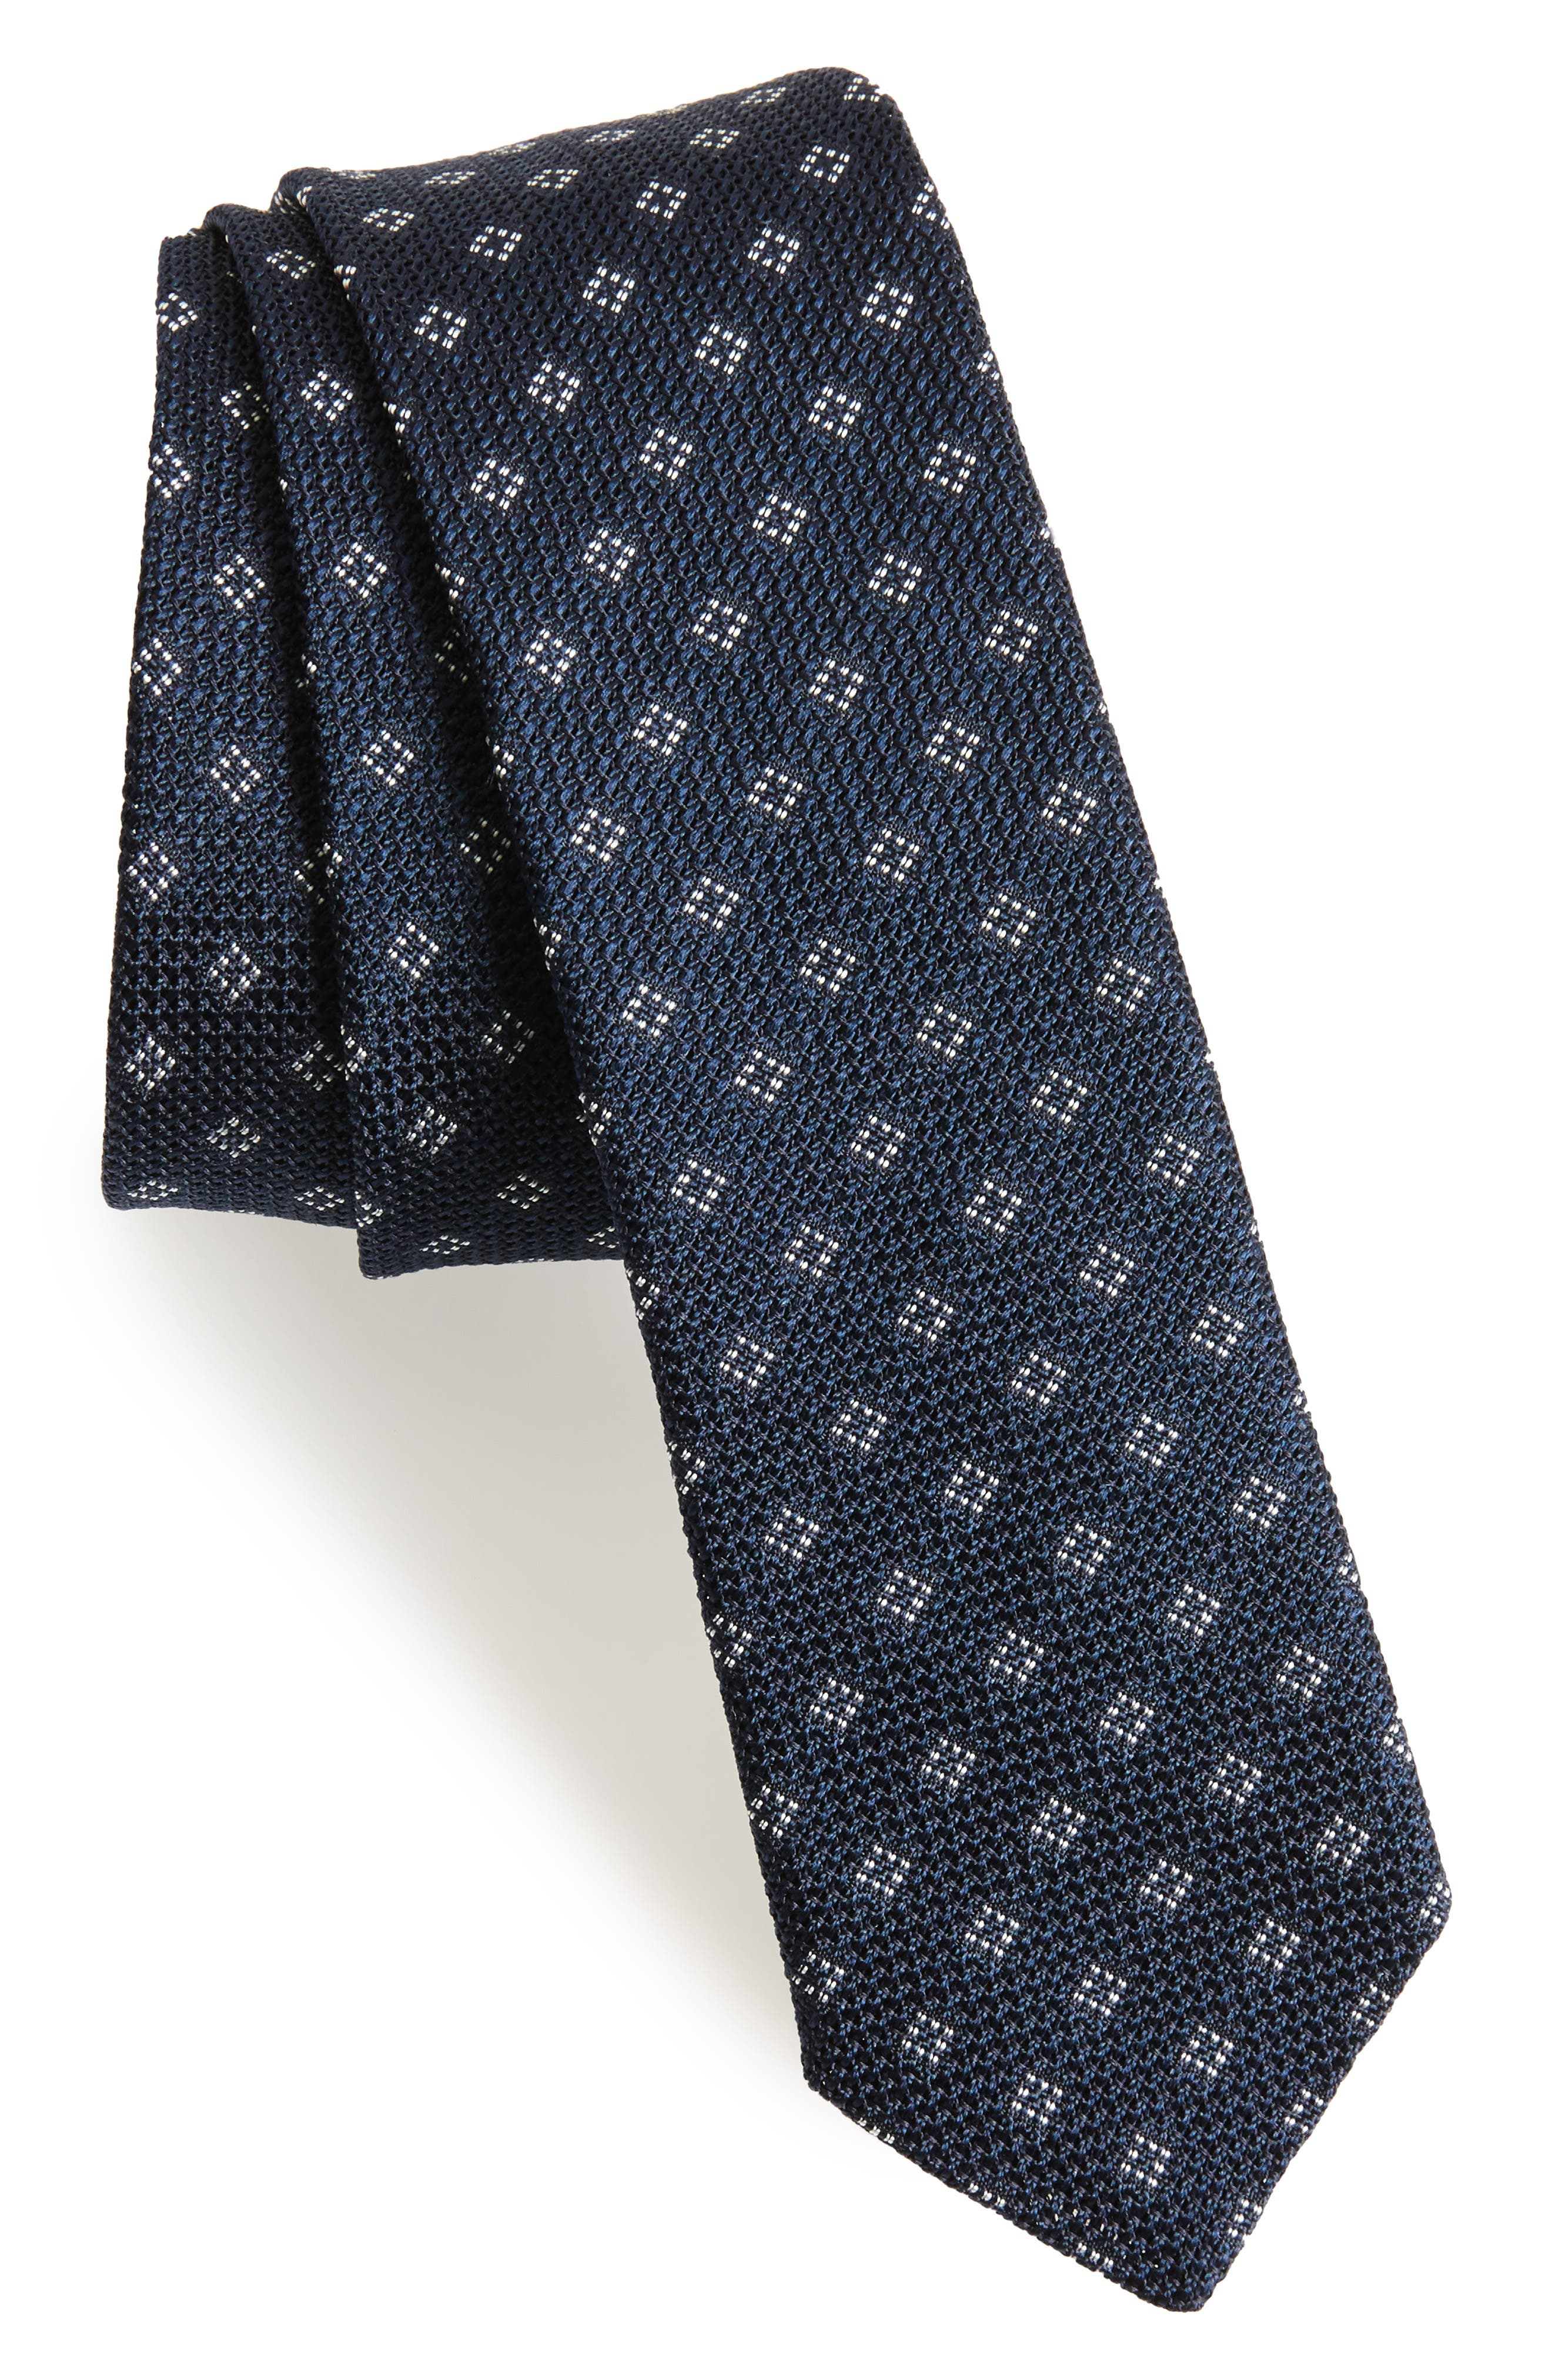 Main Image - Eleventy Medallion Silk Skinny Tie